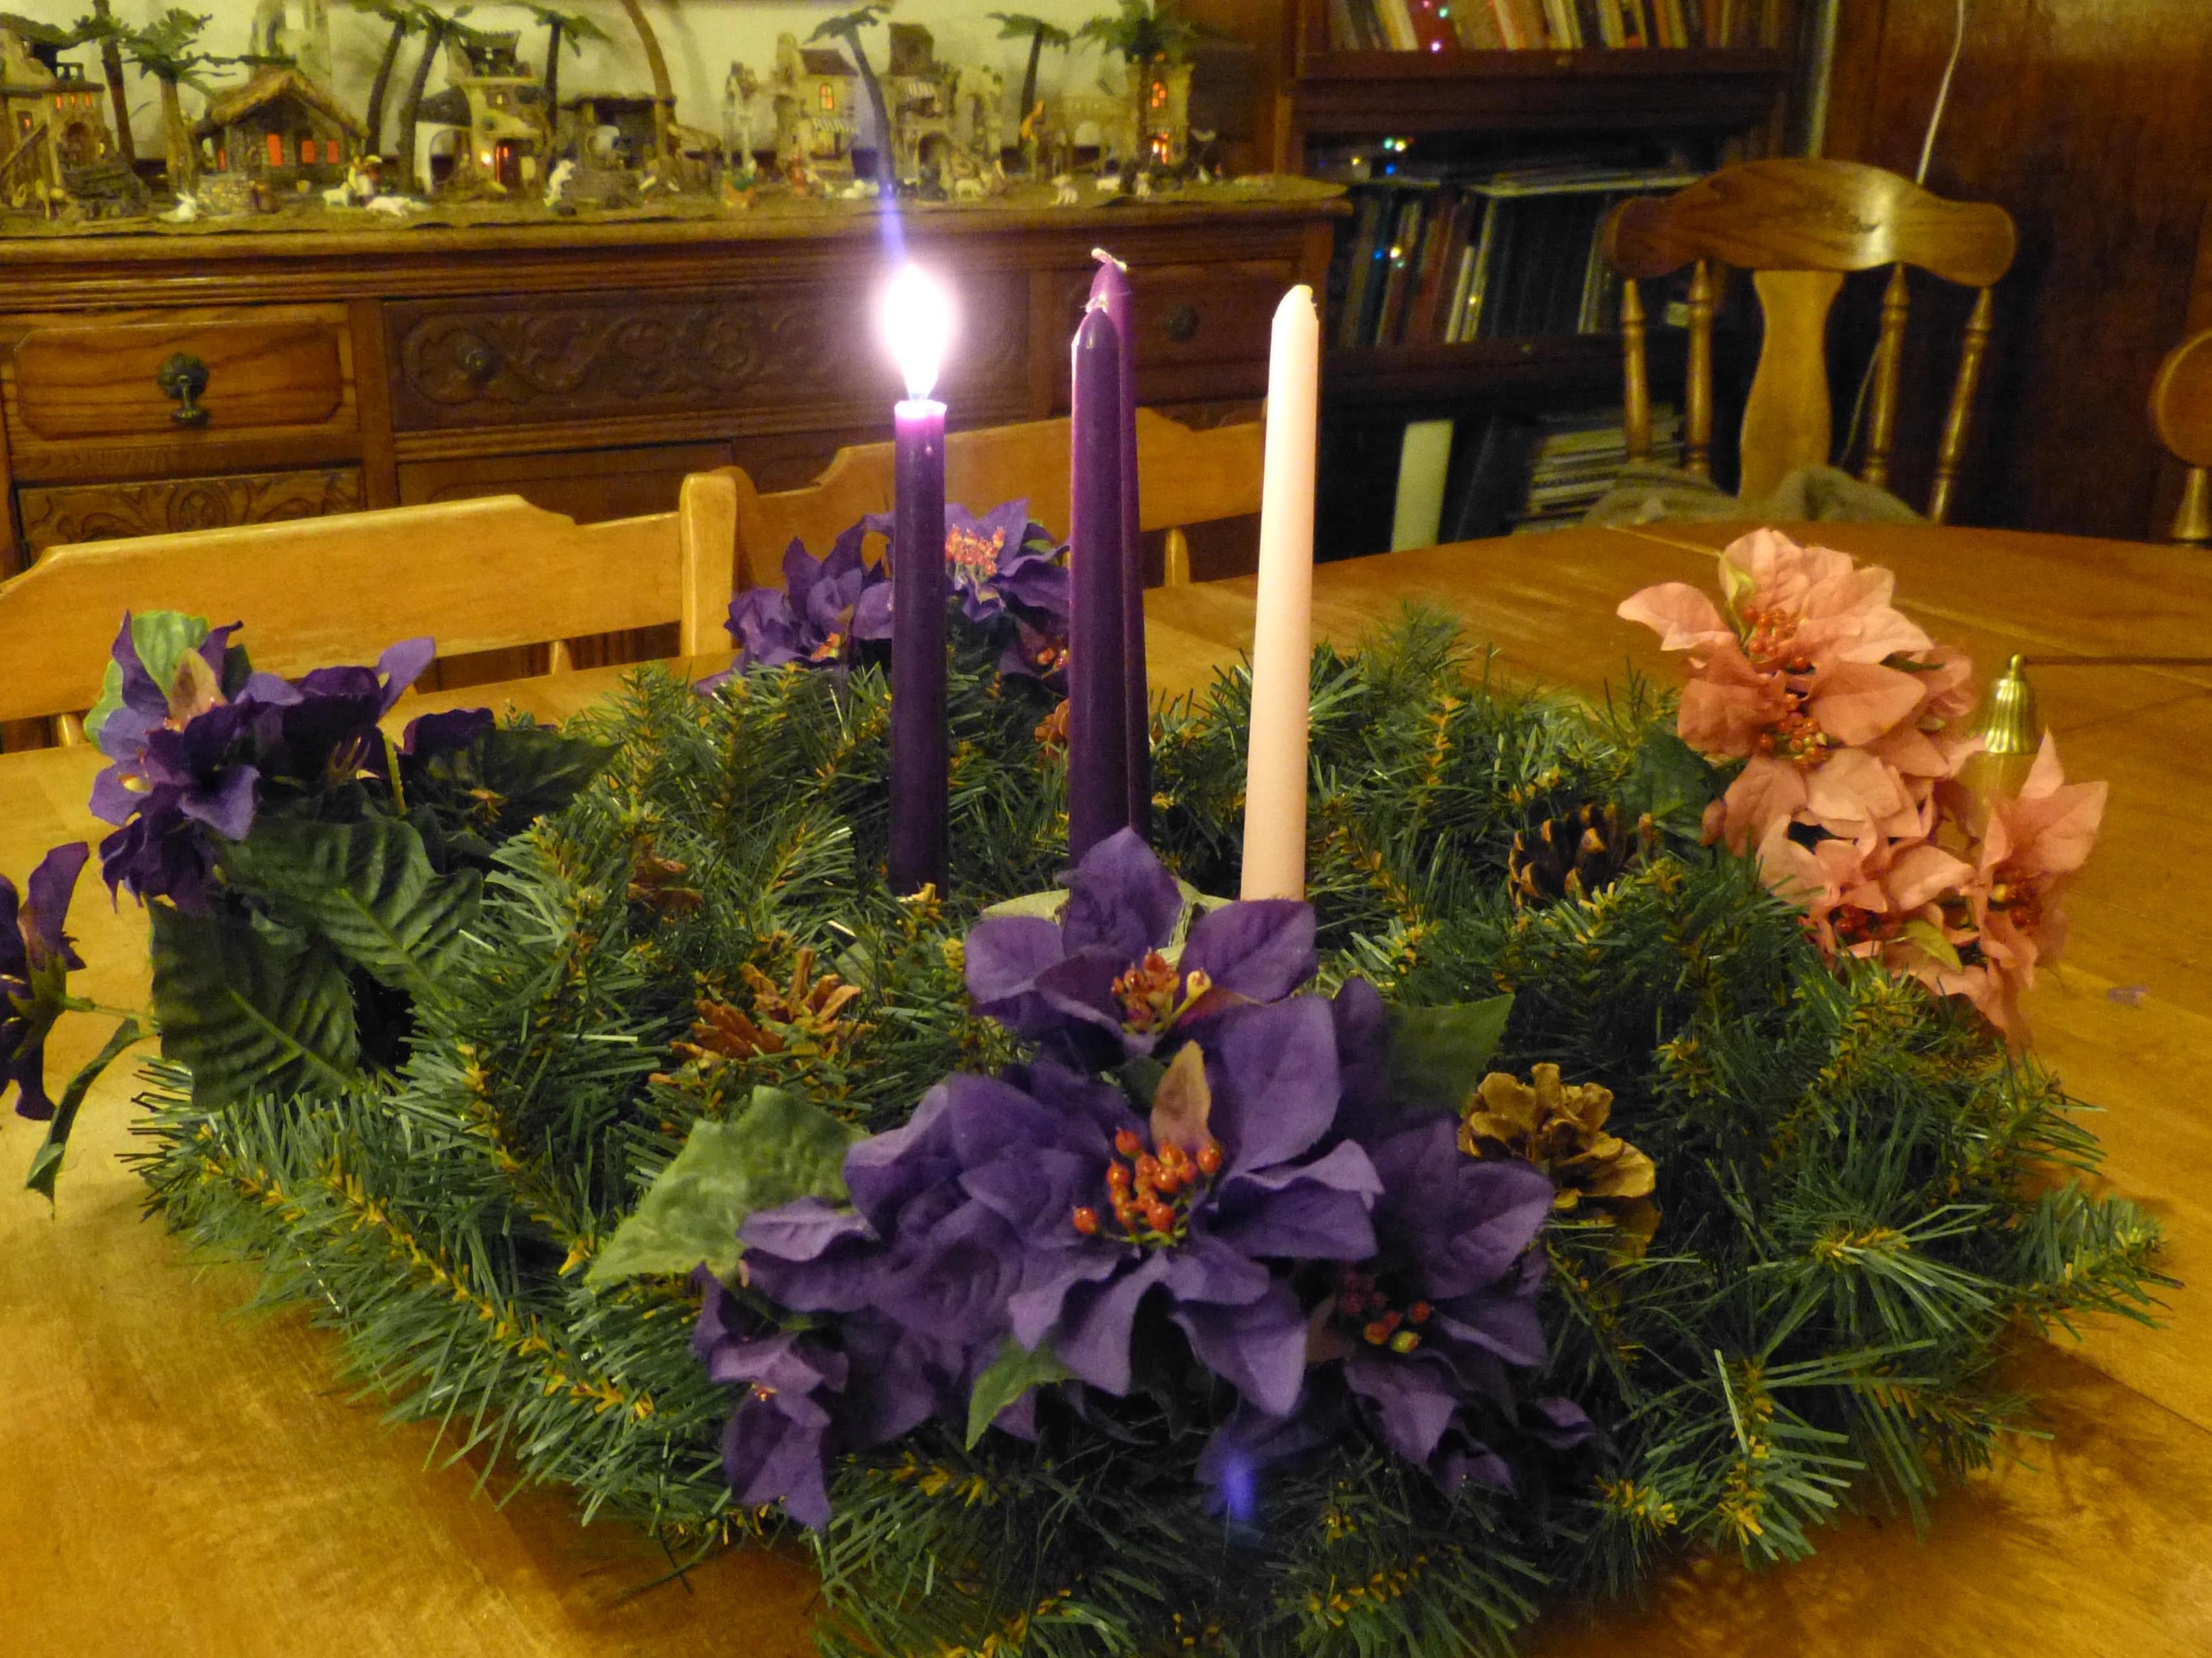 Roman Catholic Advent Season Four Joyful Weeks Before